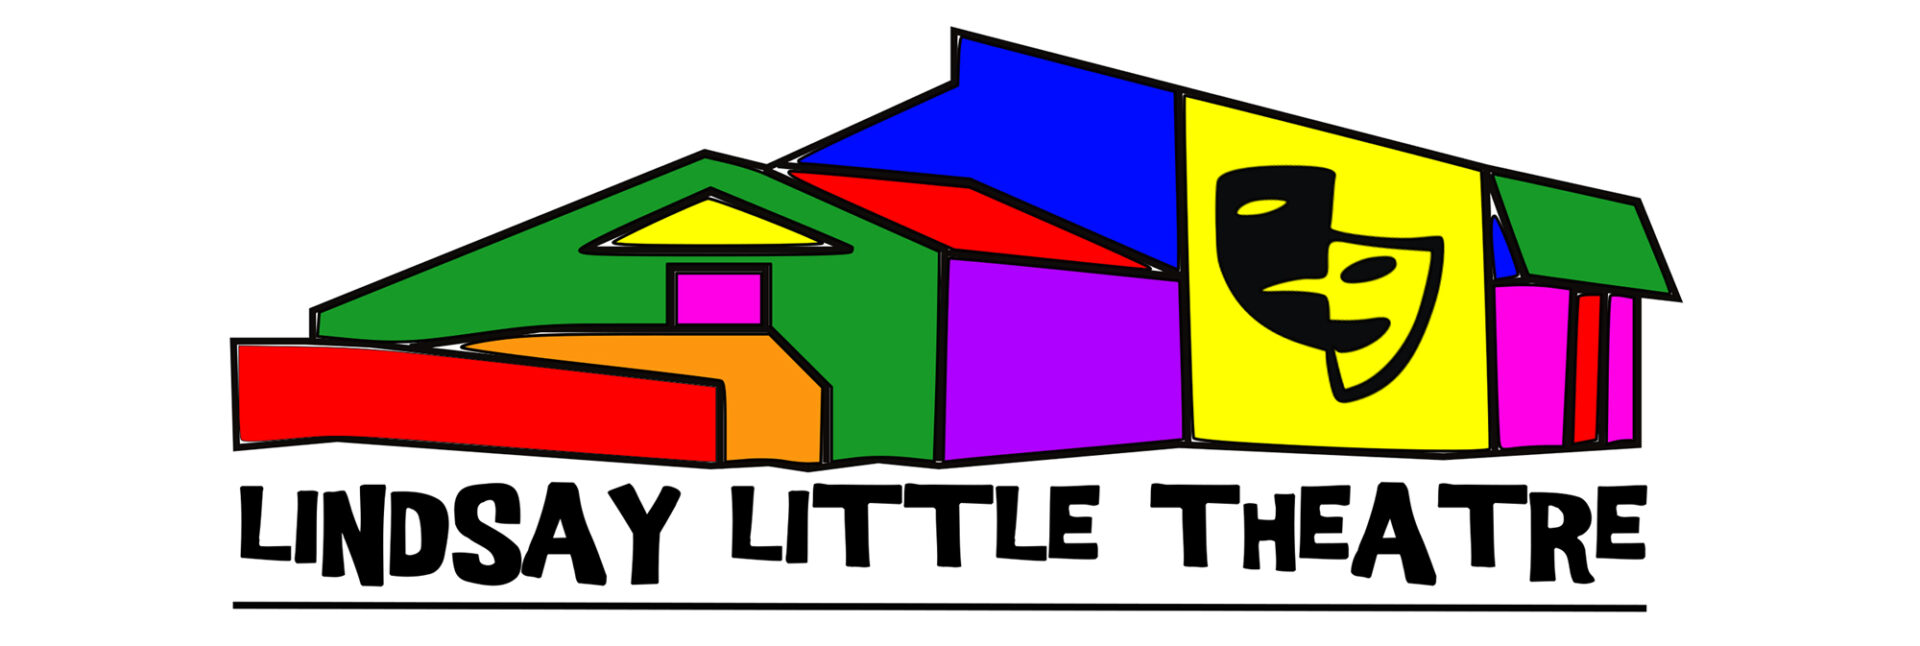 Lindsay Little Theatre